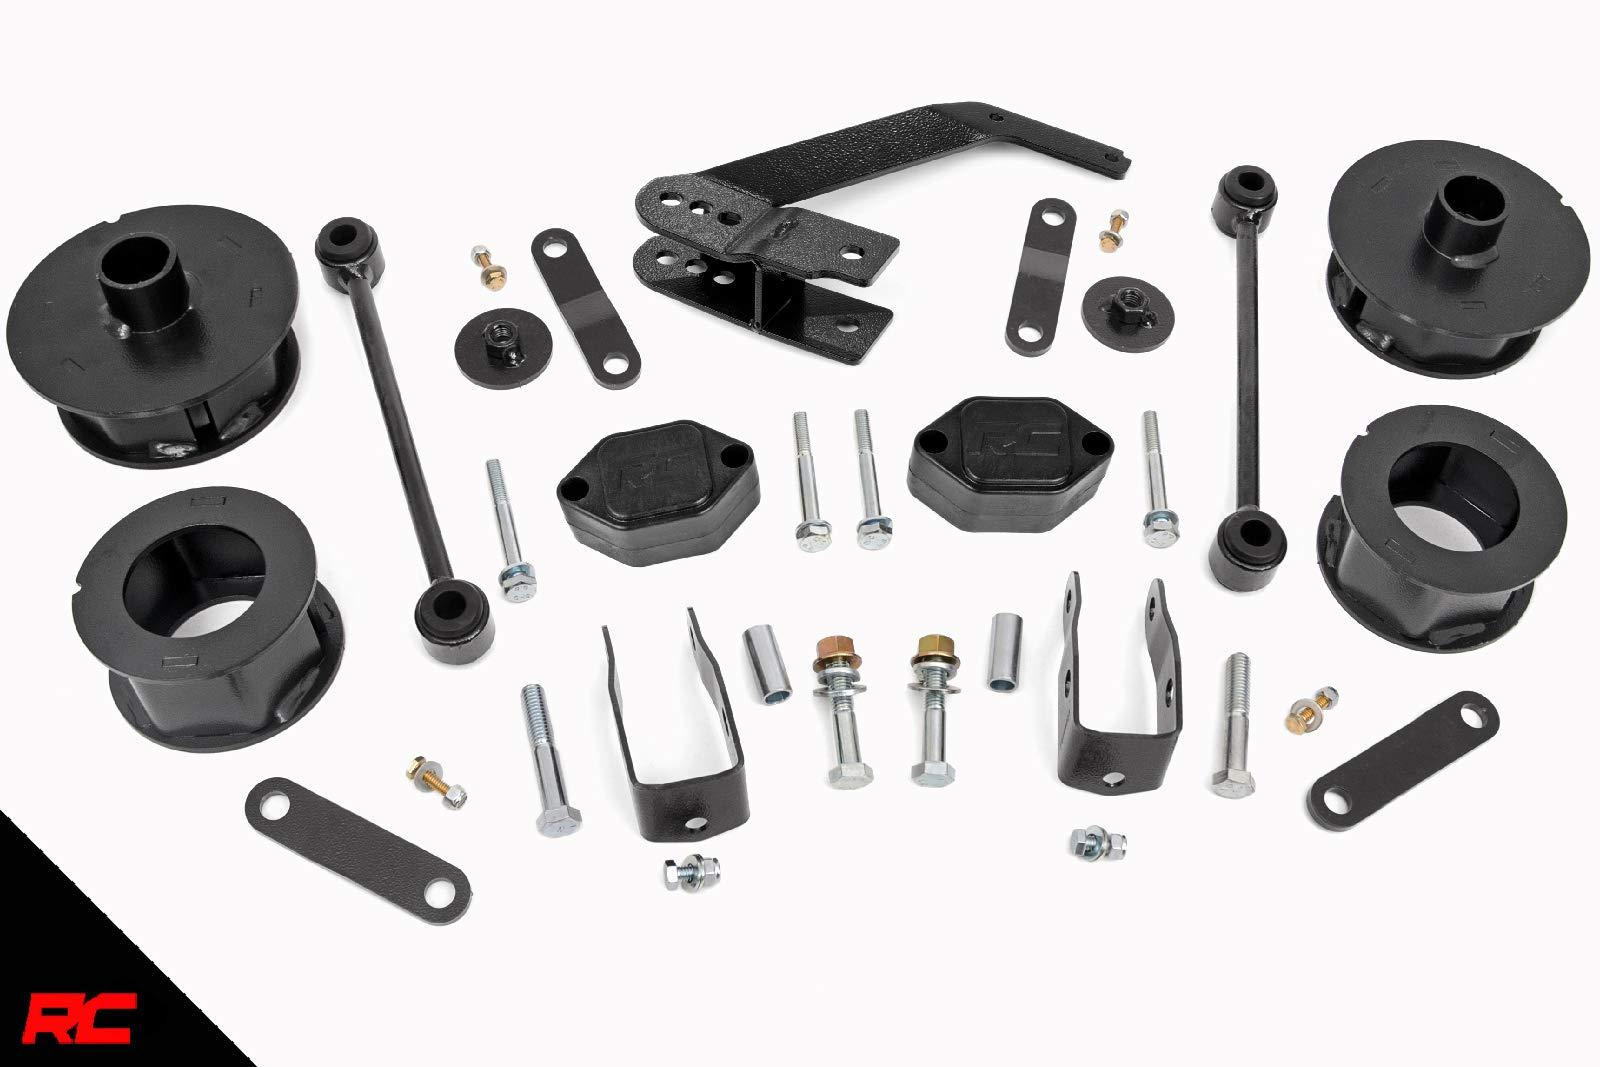 OEM Part Honda 96600-08032-07 Bolt Genuine Original Equipment Manufacturer